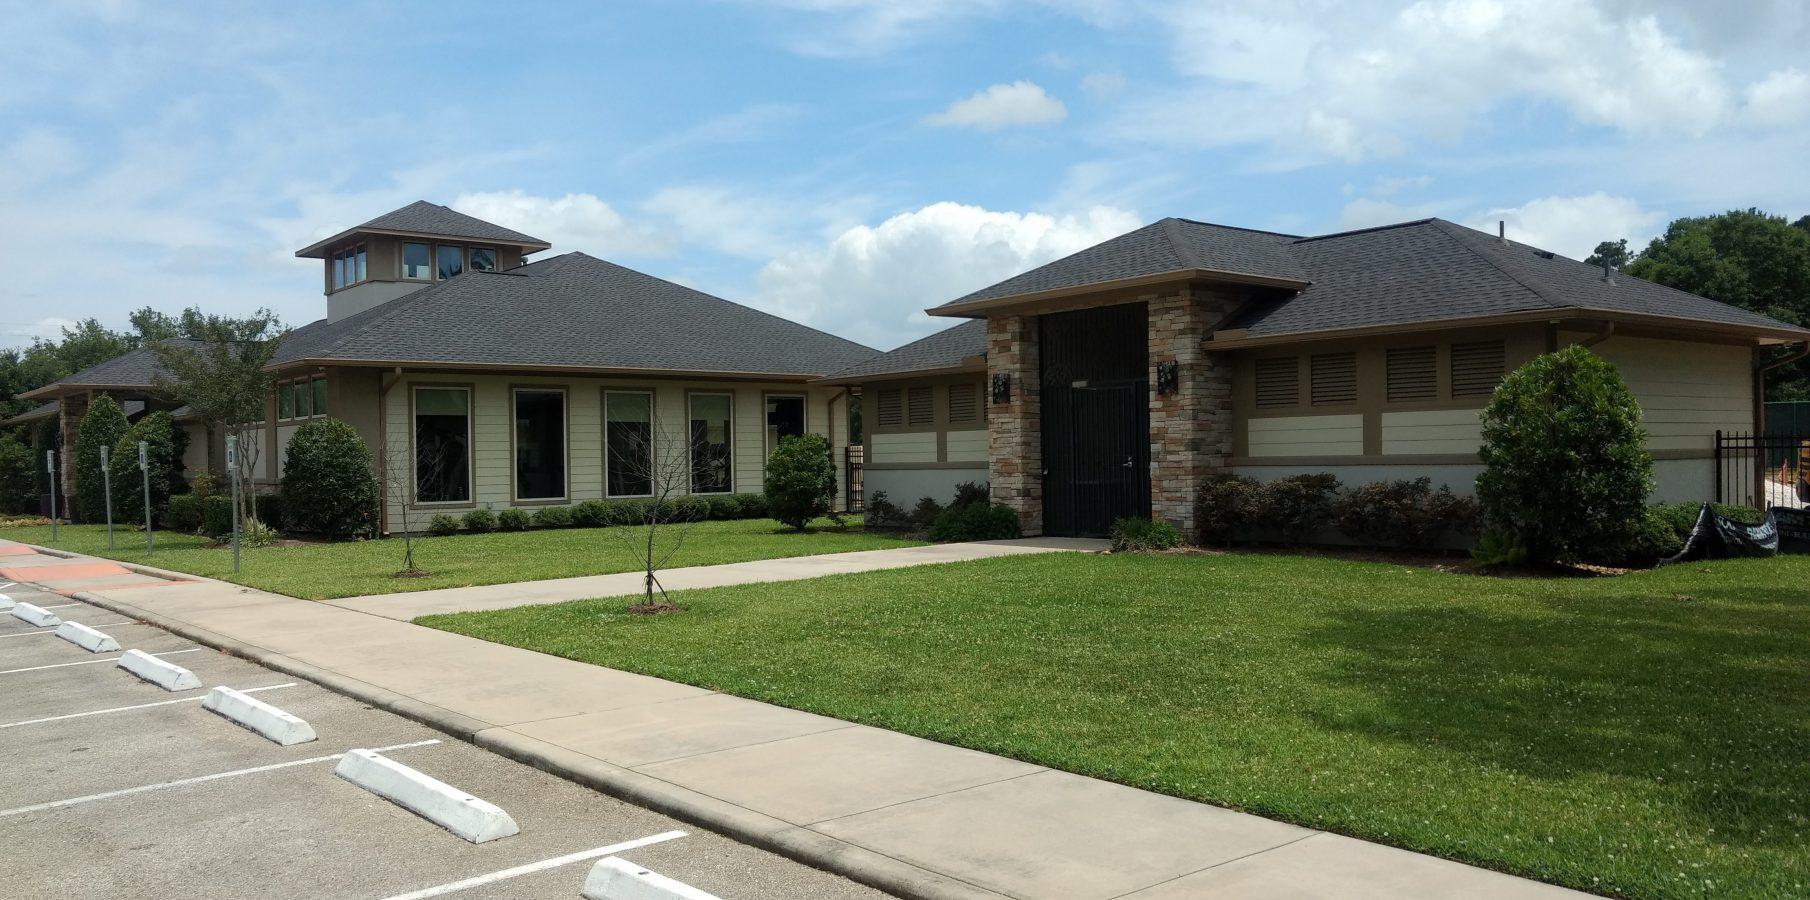 Memorial NW Community Center